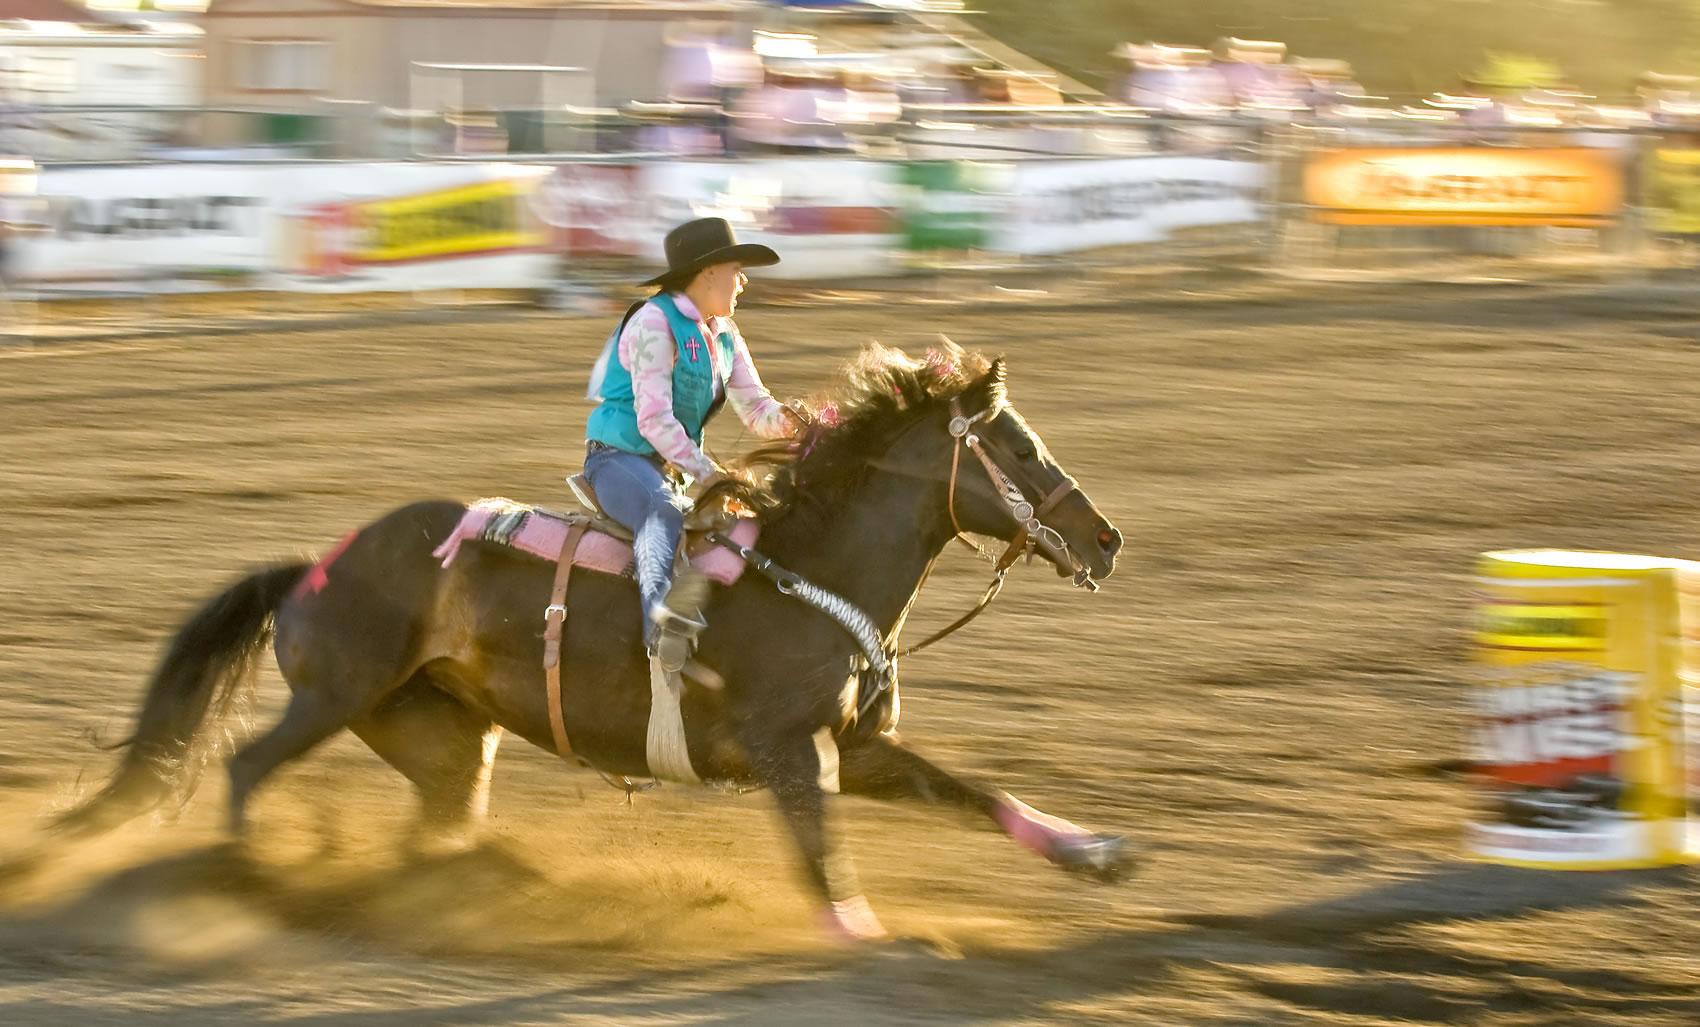 Woman barrel racing